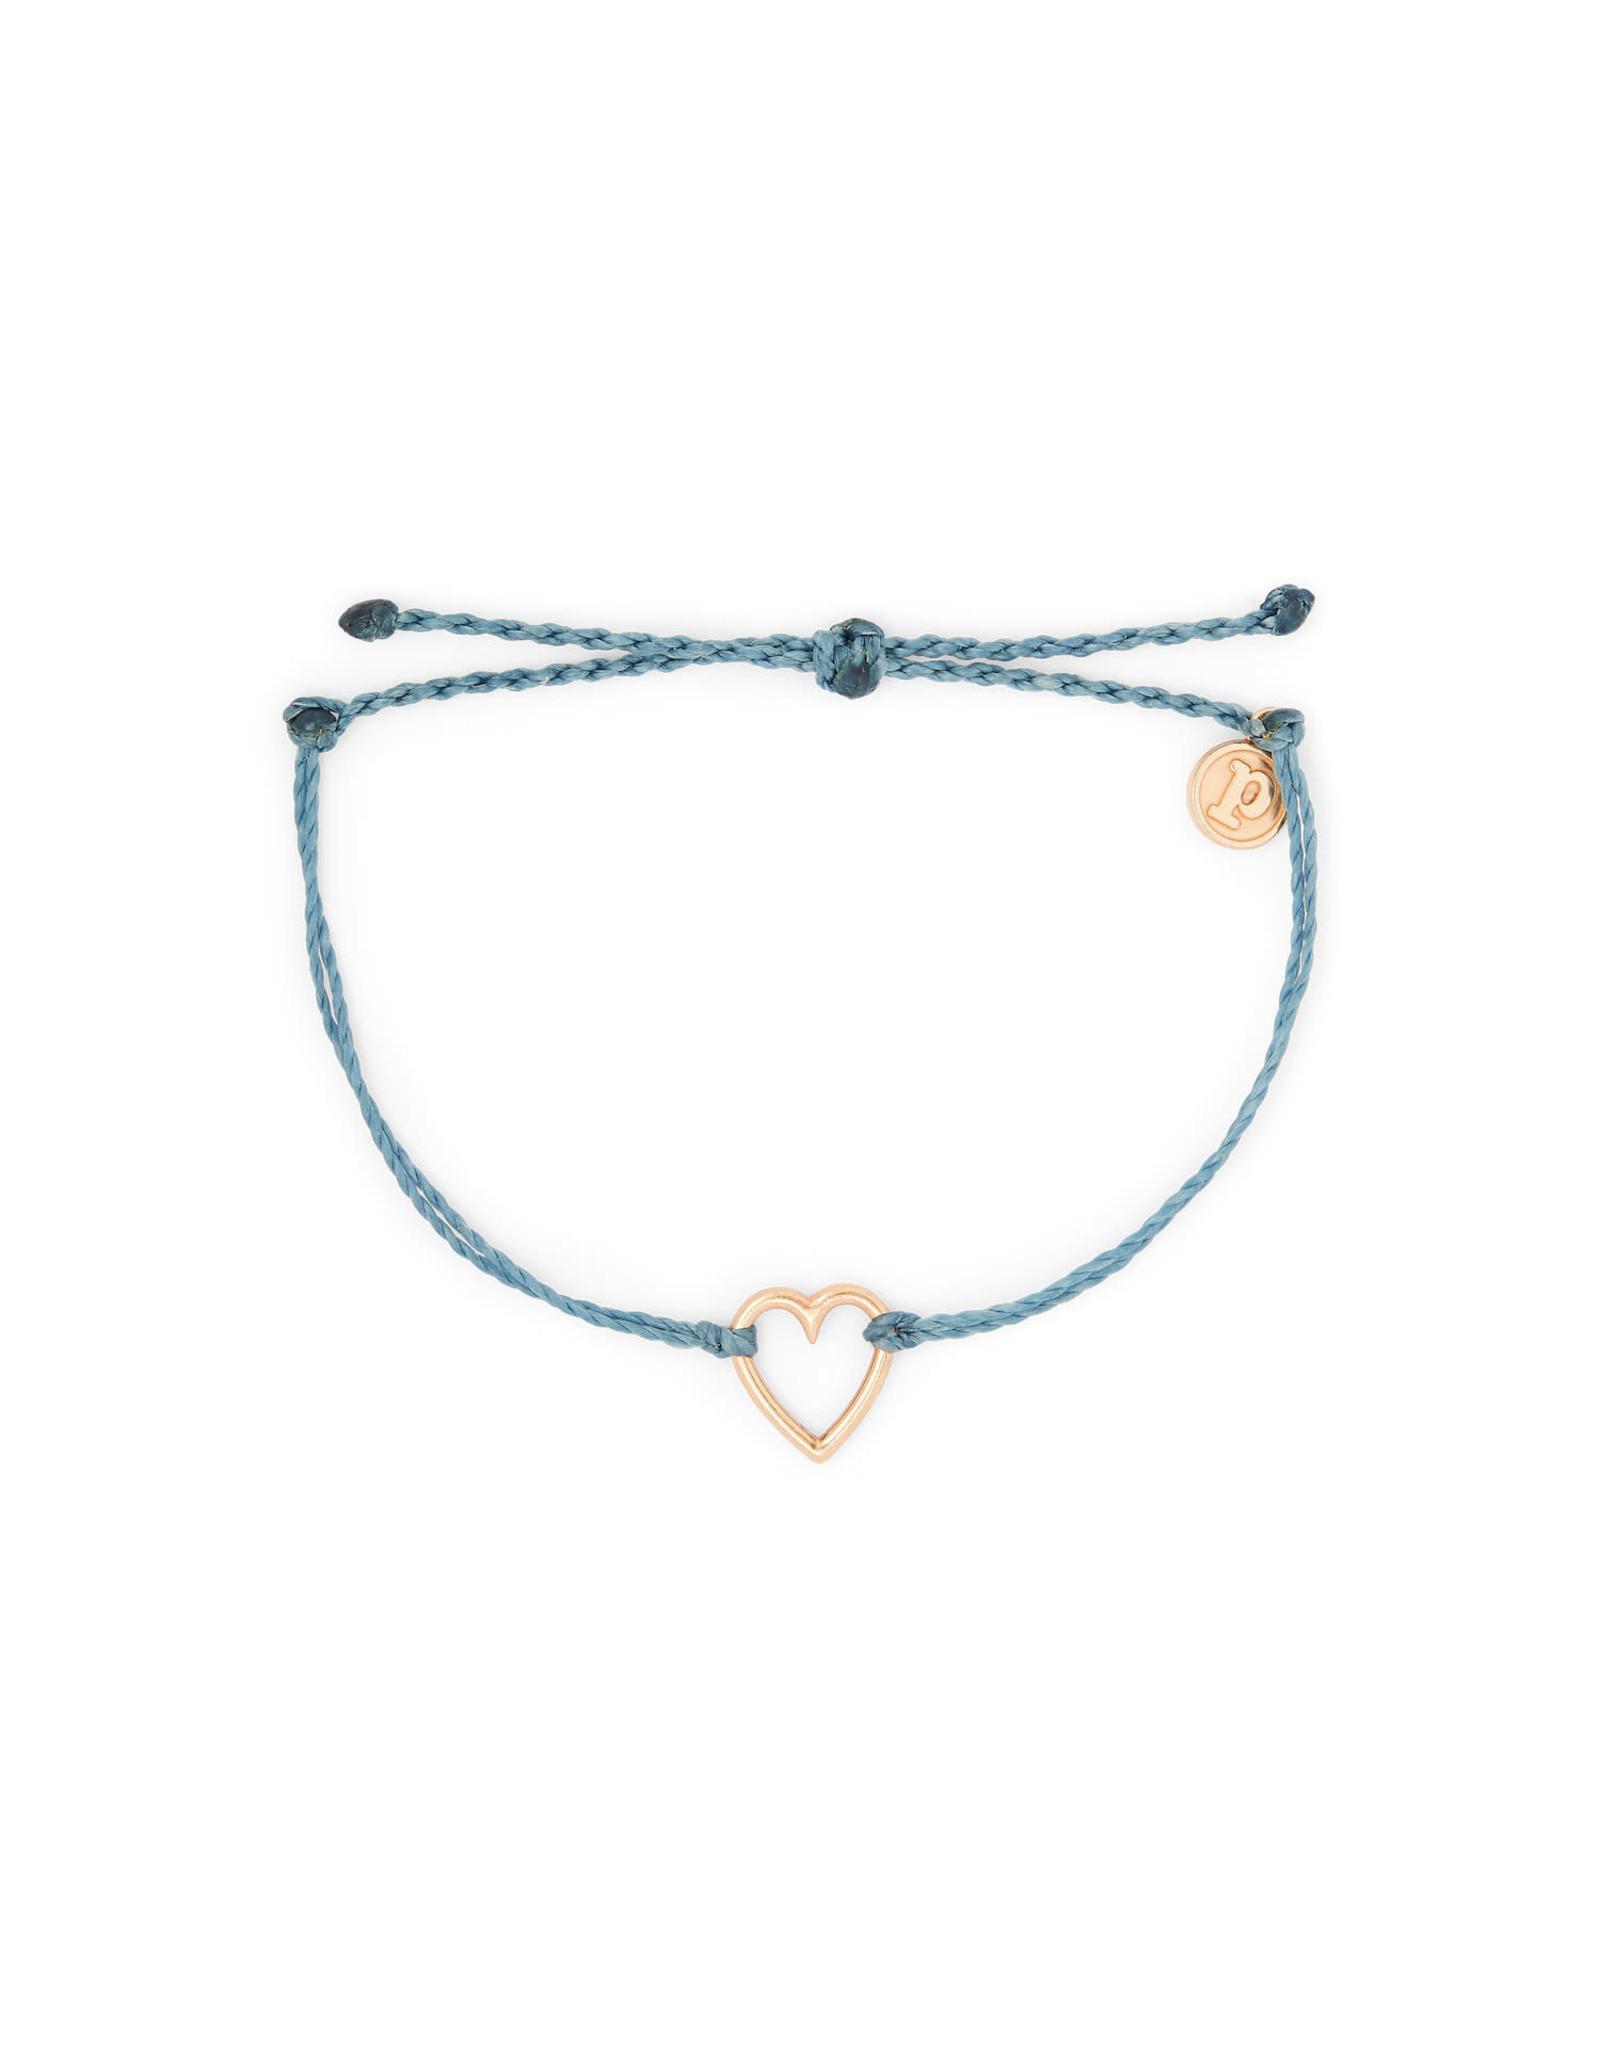 PURA VIDA BRACELET ROSE GOLD HEART DUSTY BLUE